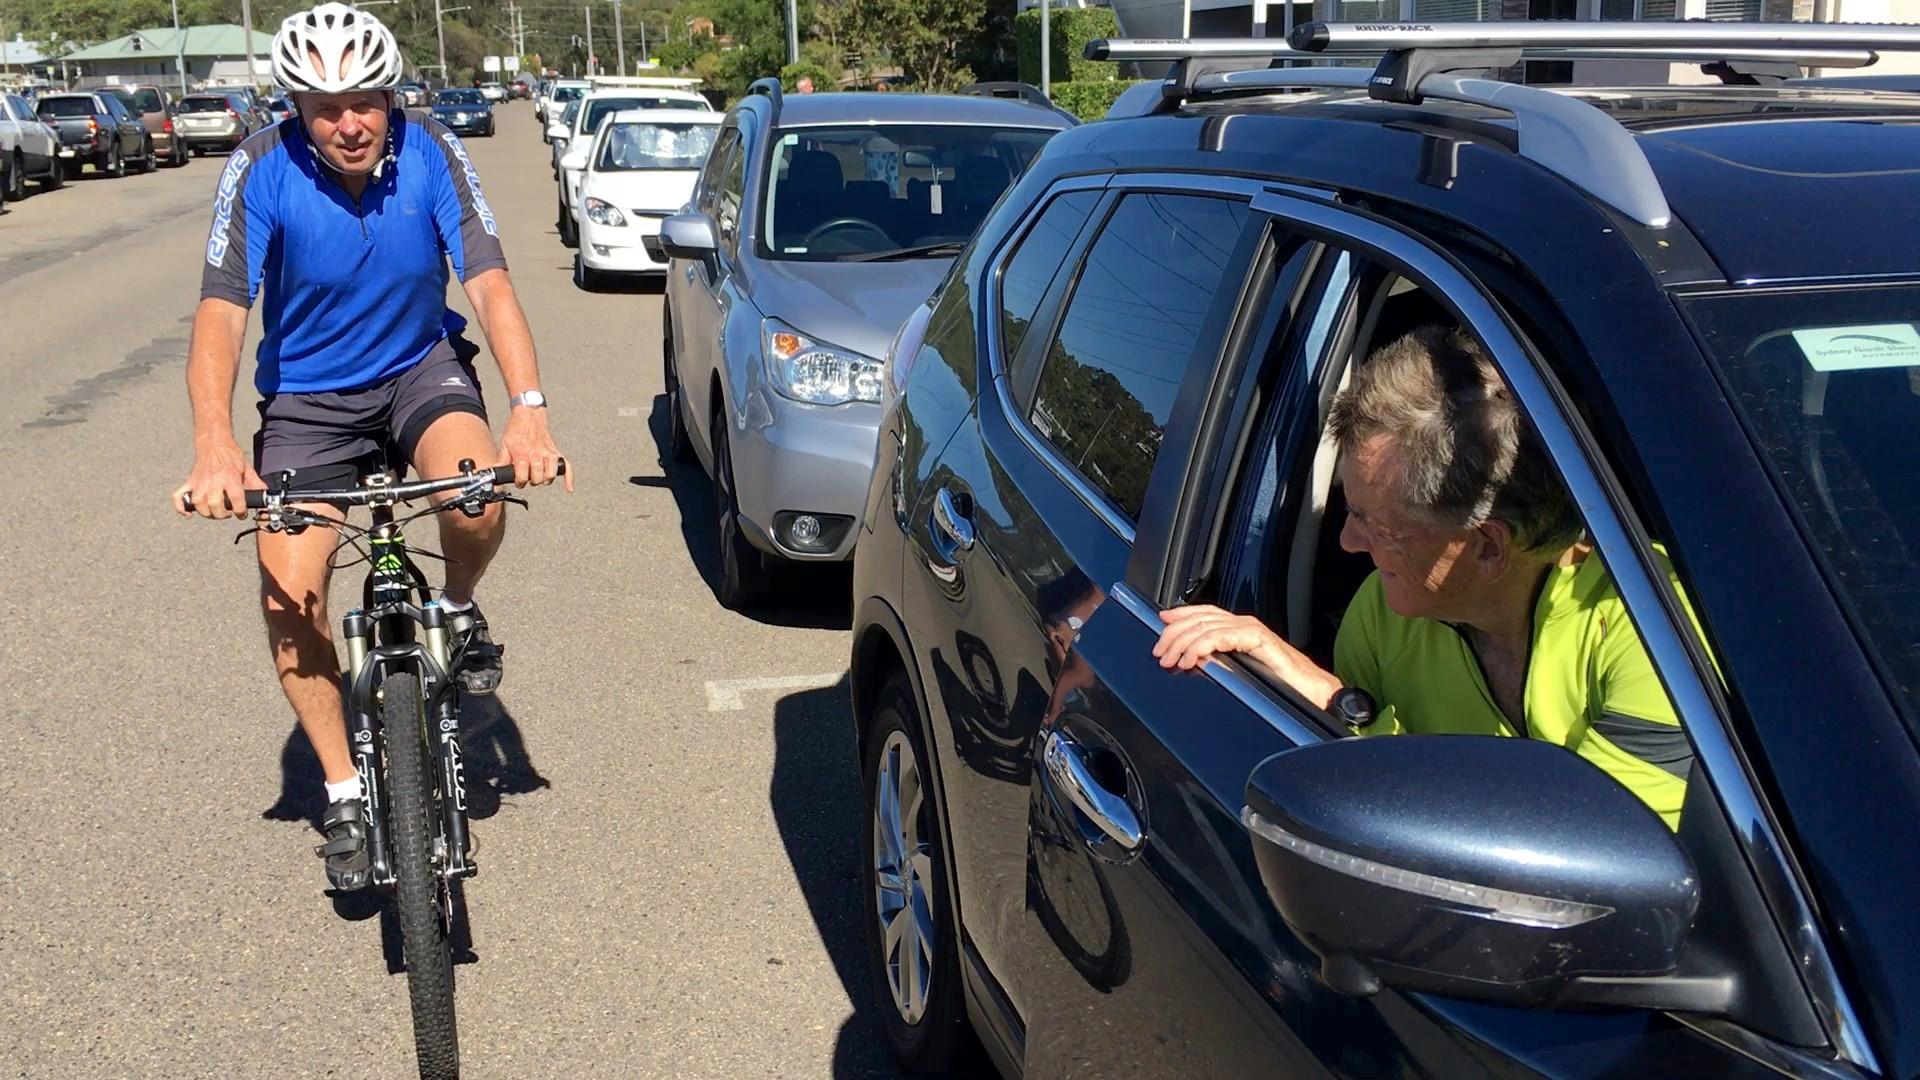 Dooring a cyclist